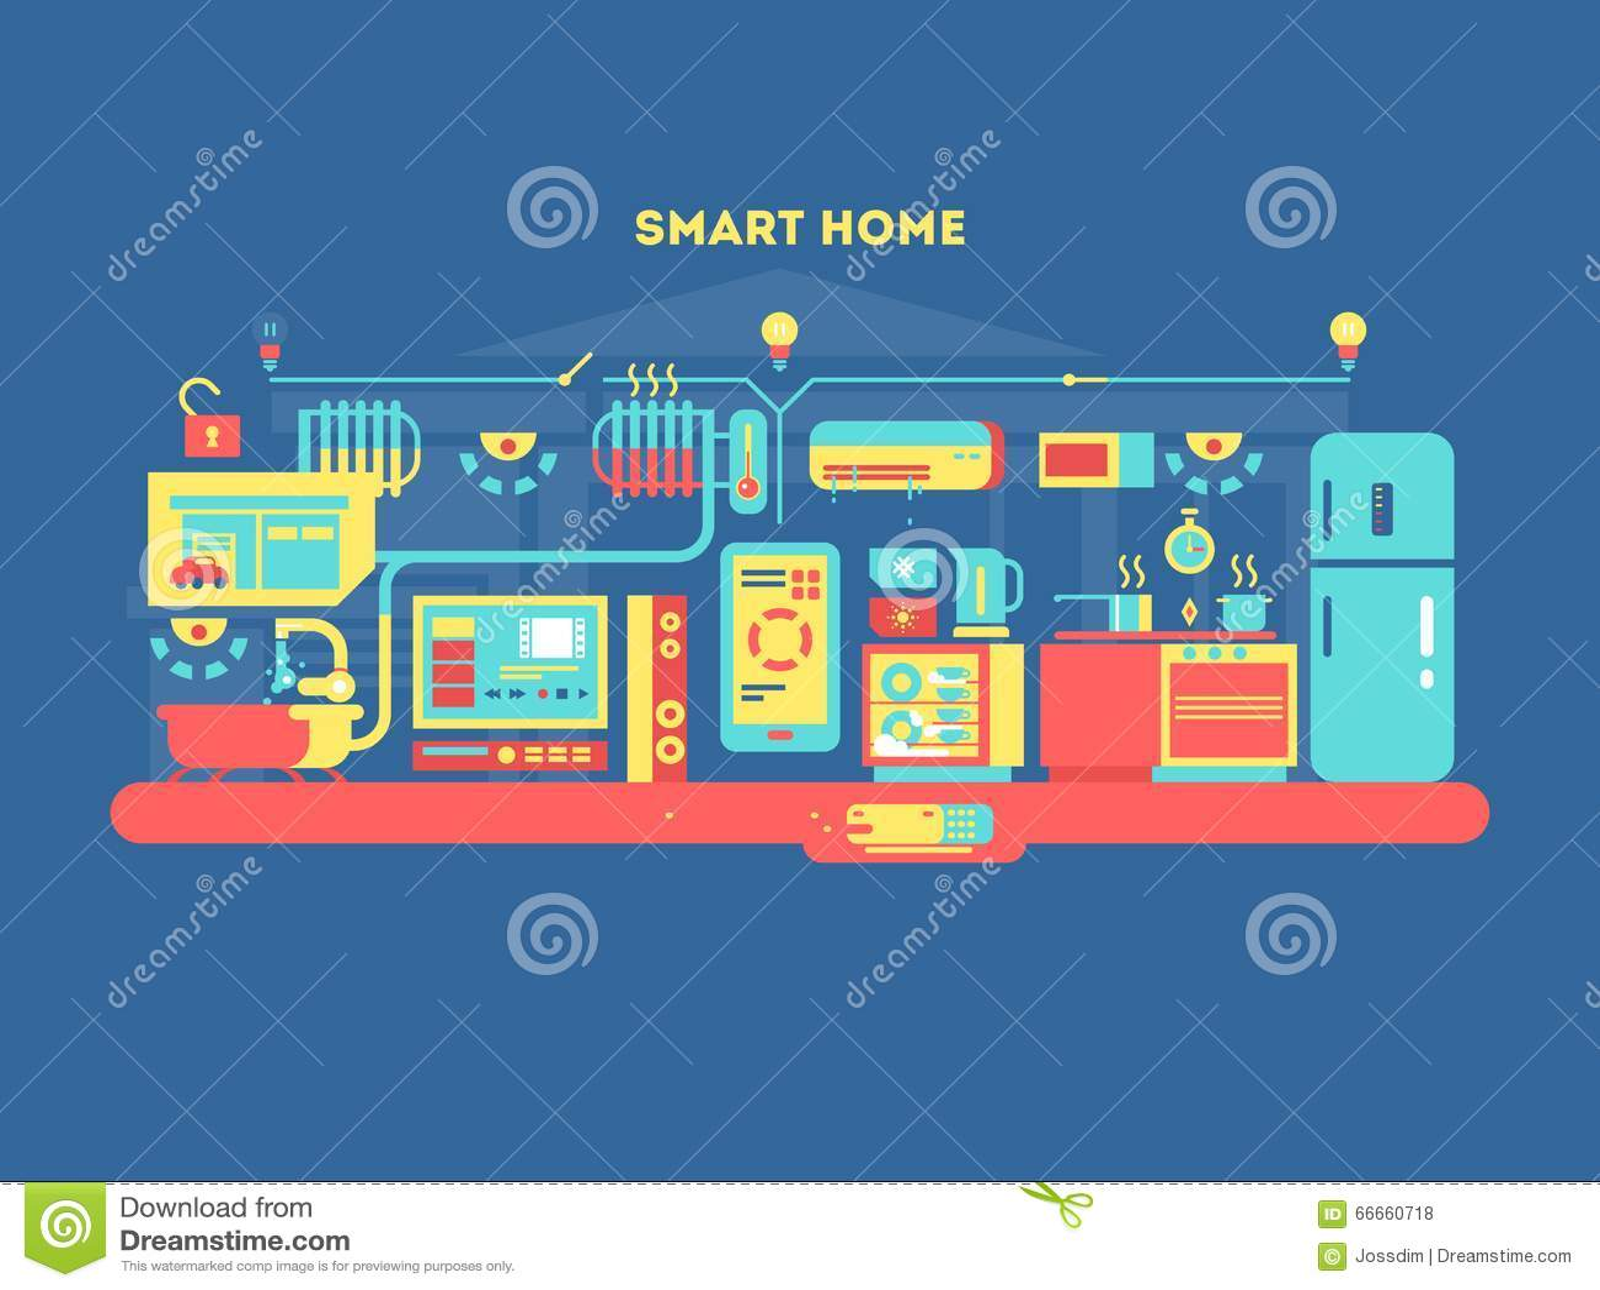 Smart Home Design Concept Stock Vector Image 66660718